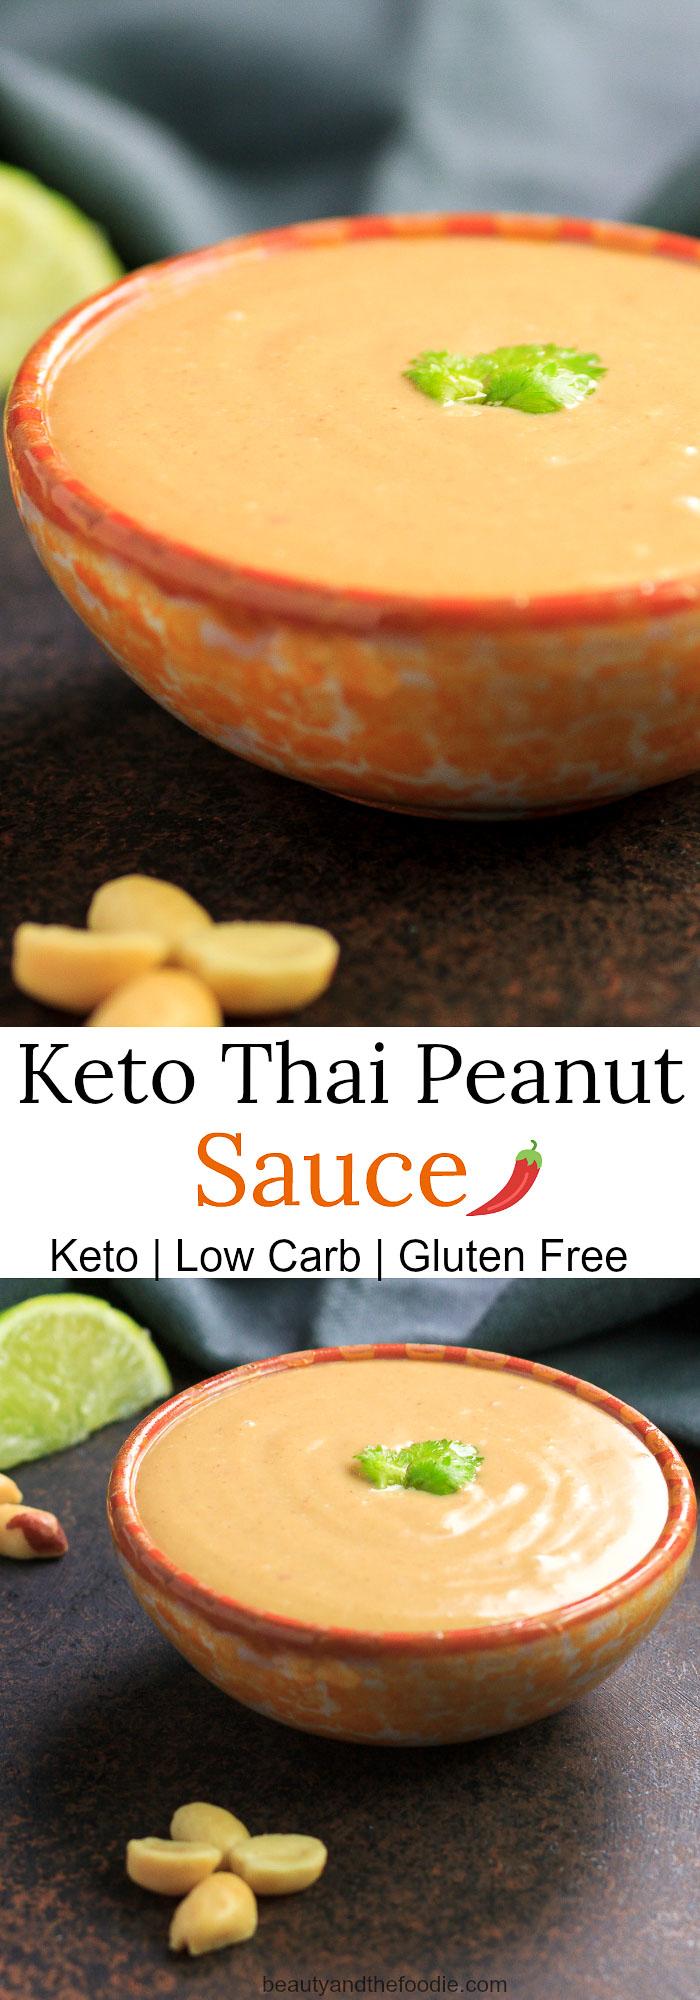 Keto Thai Peanut Sauce- Low carb, gluten free, dairy free.